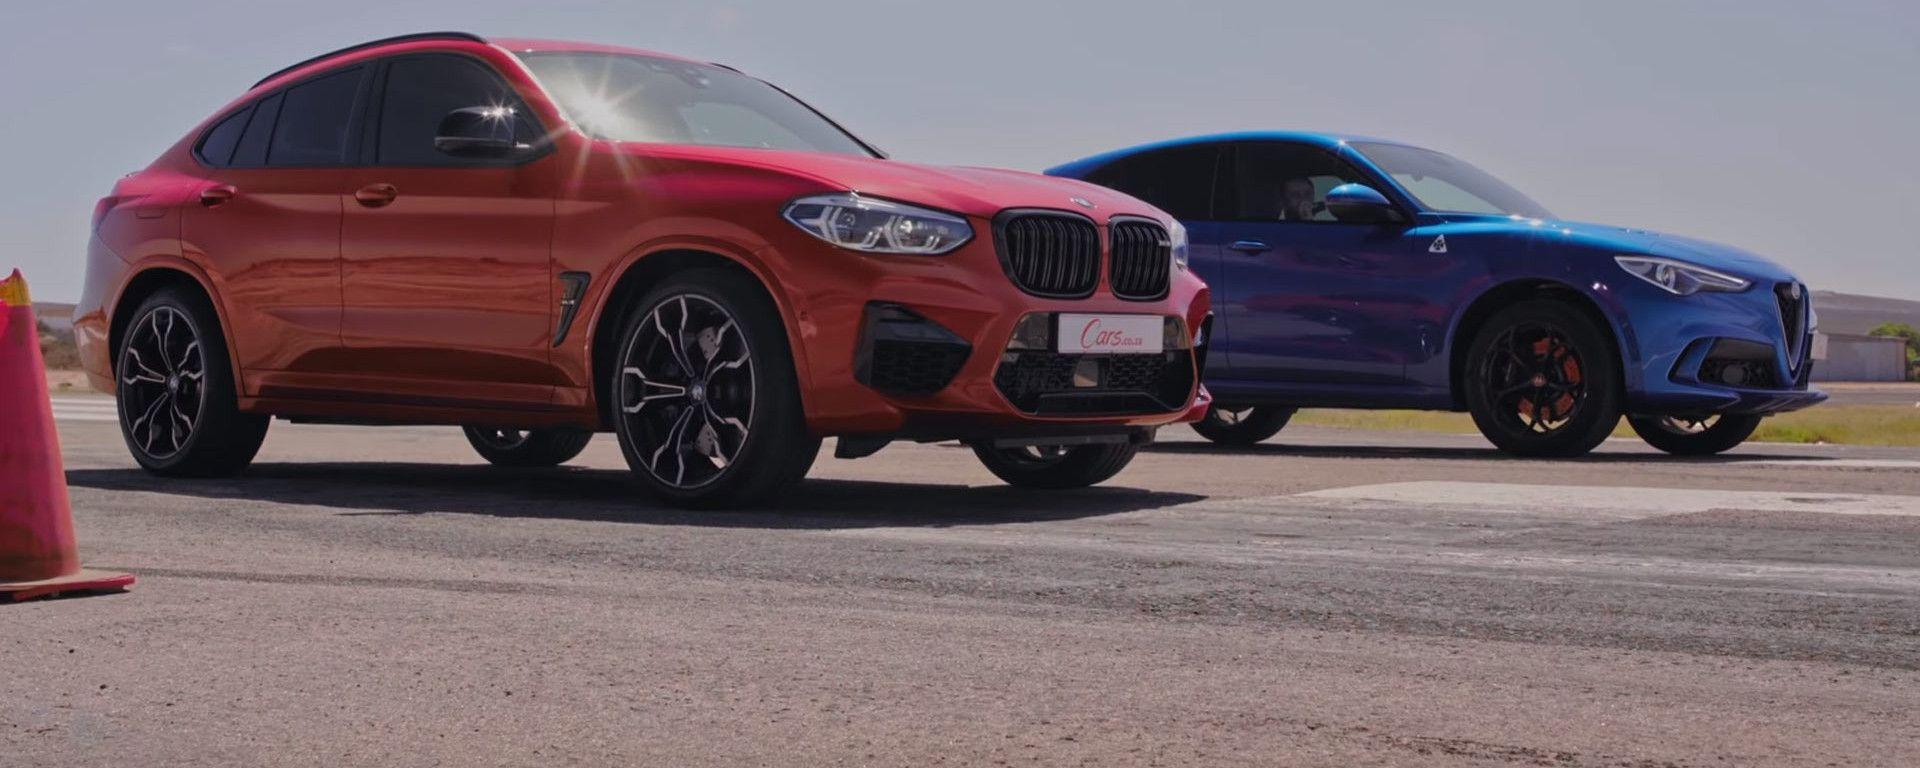 Alfa Romeo Stelvio Quadrifoglio VS BMW X4 M: drag race in video